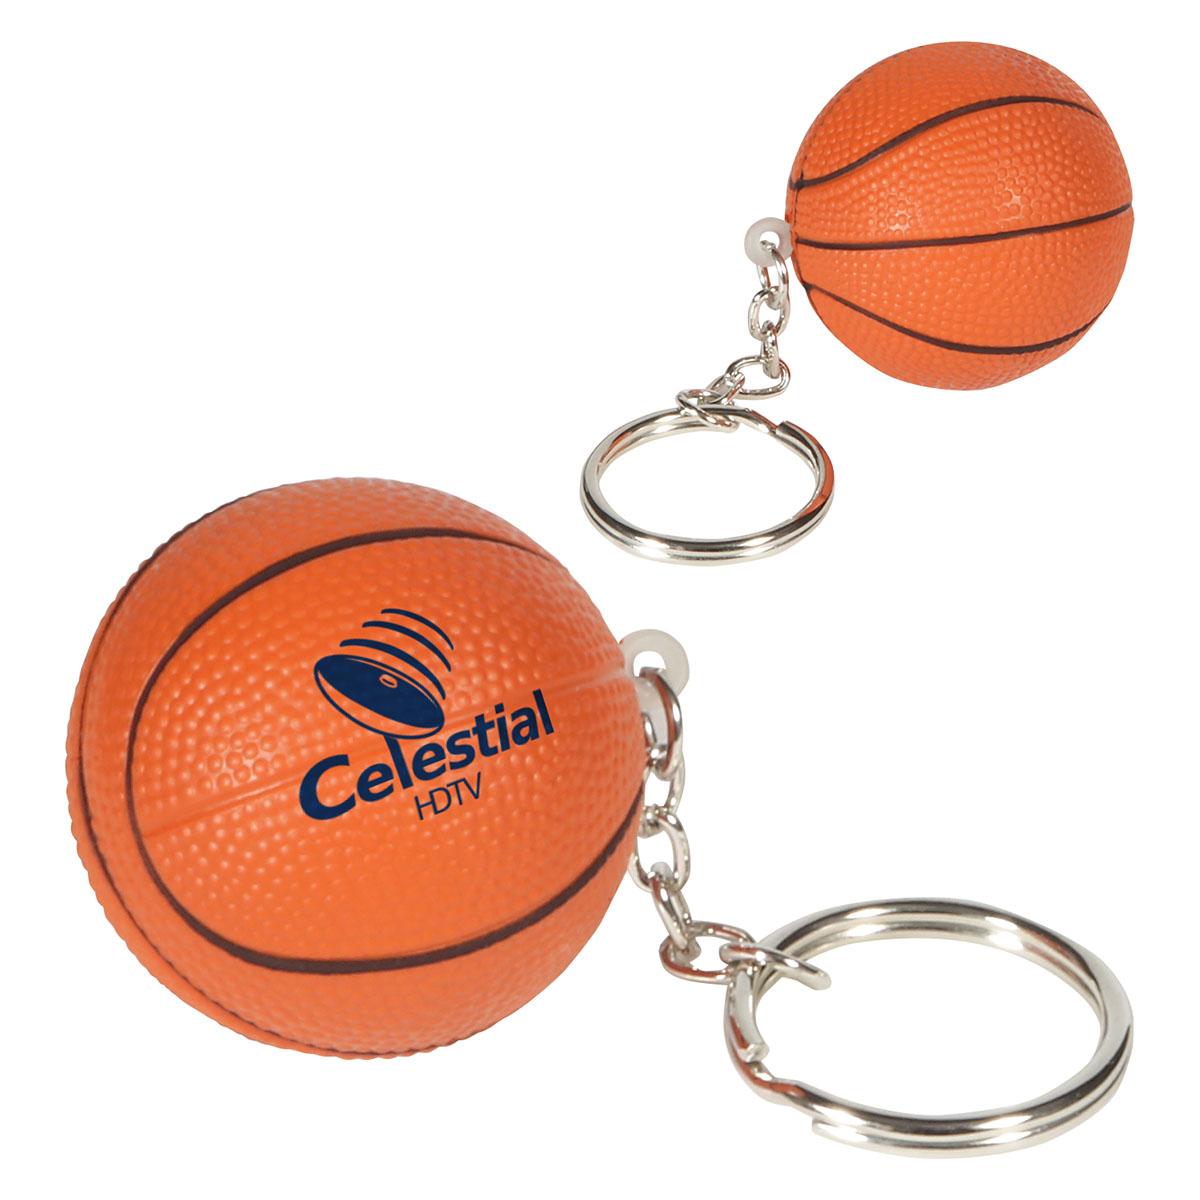 Basketball Stress Reliever Key Chain, LKC-BK02, 1 Colour Imprint